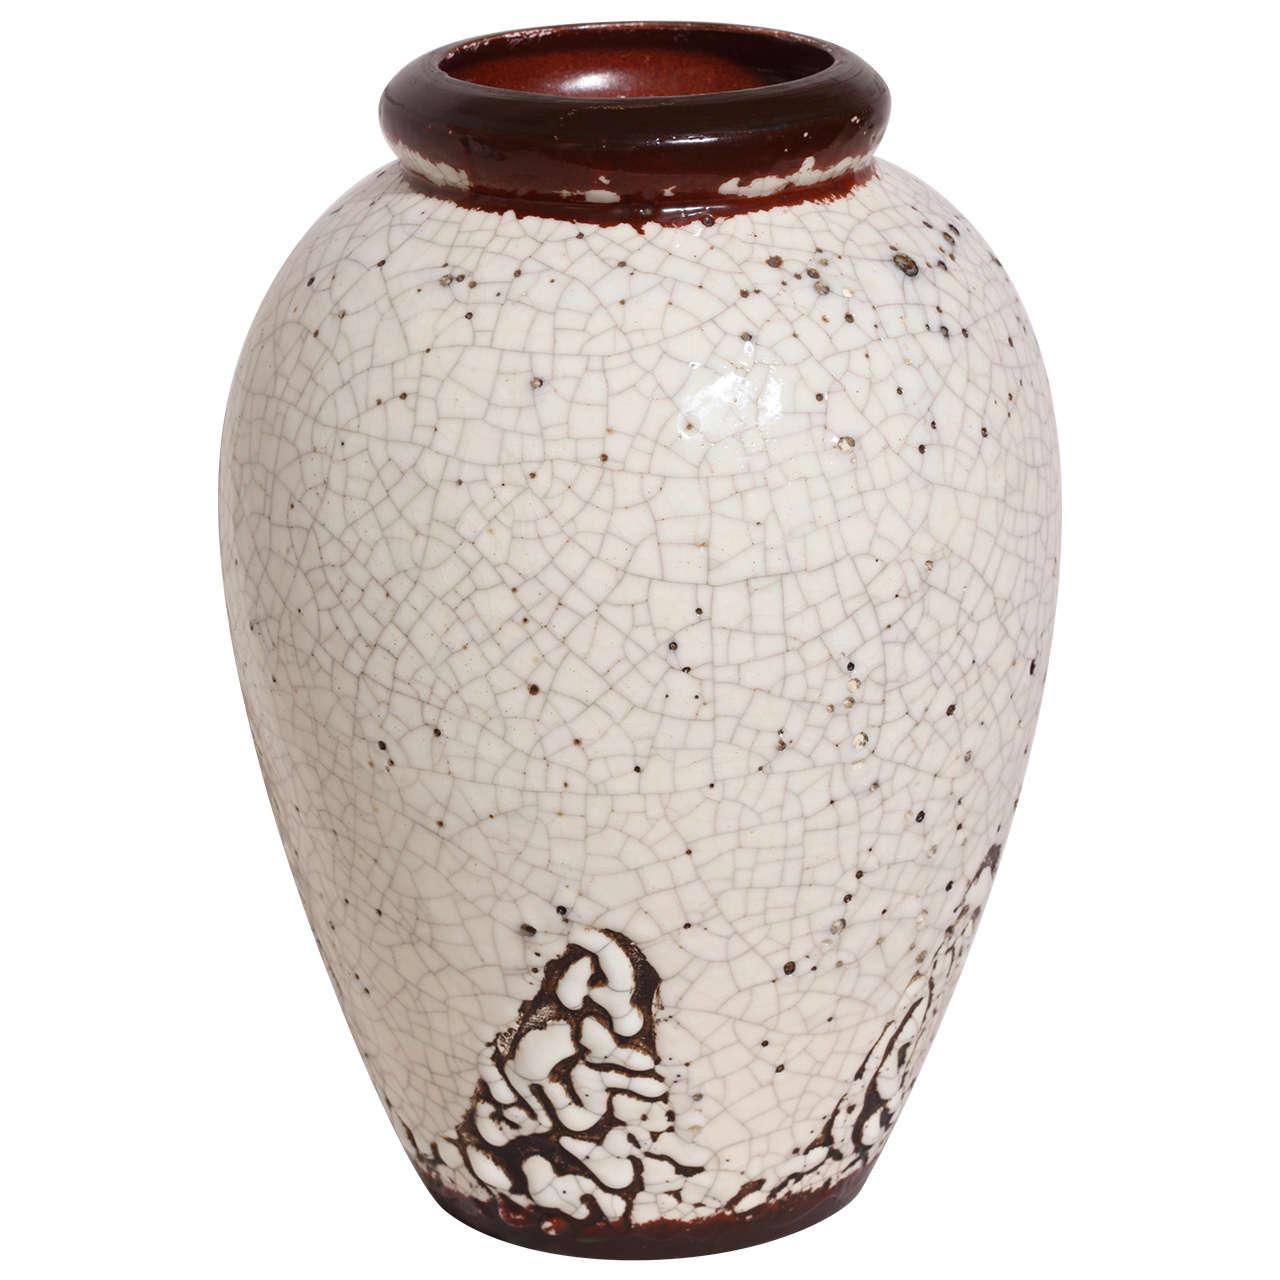 Jean Besnard French Art Deco Stoneware Vase